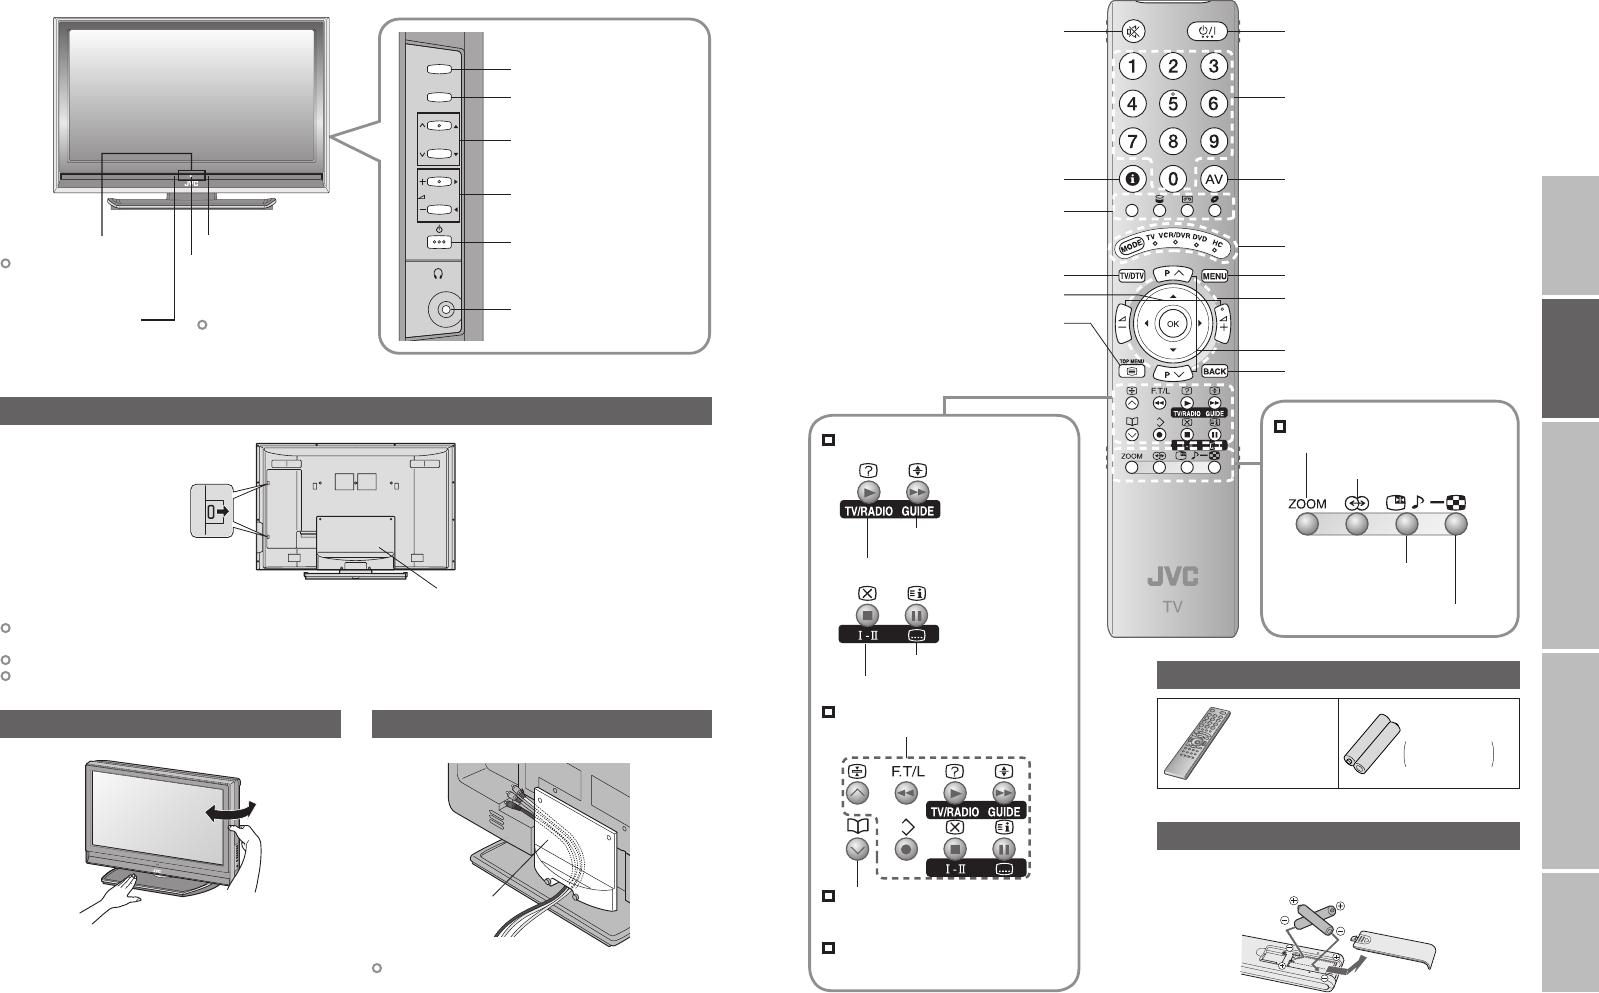 Jvc Lt 46dz7bj User Manual Lct2182 001a U En Wiring Diagram For S17 5